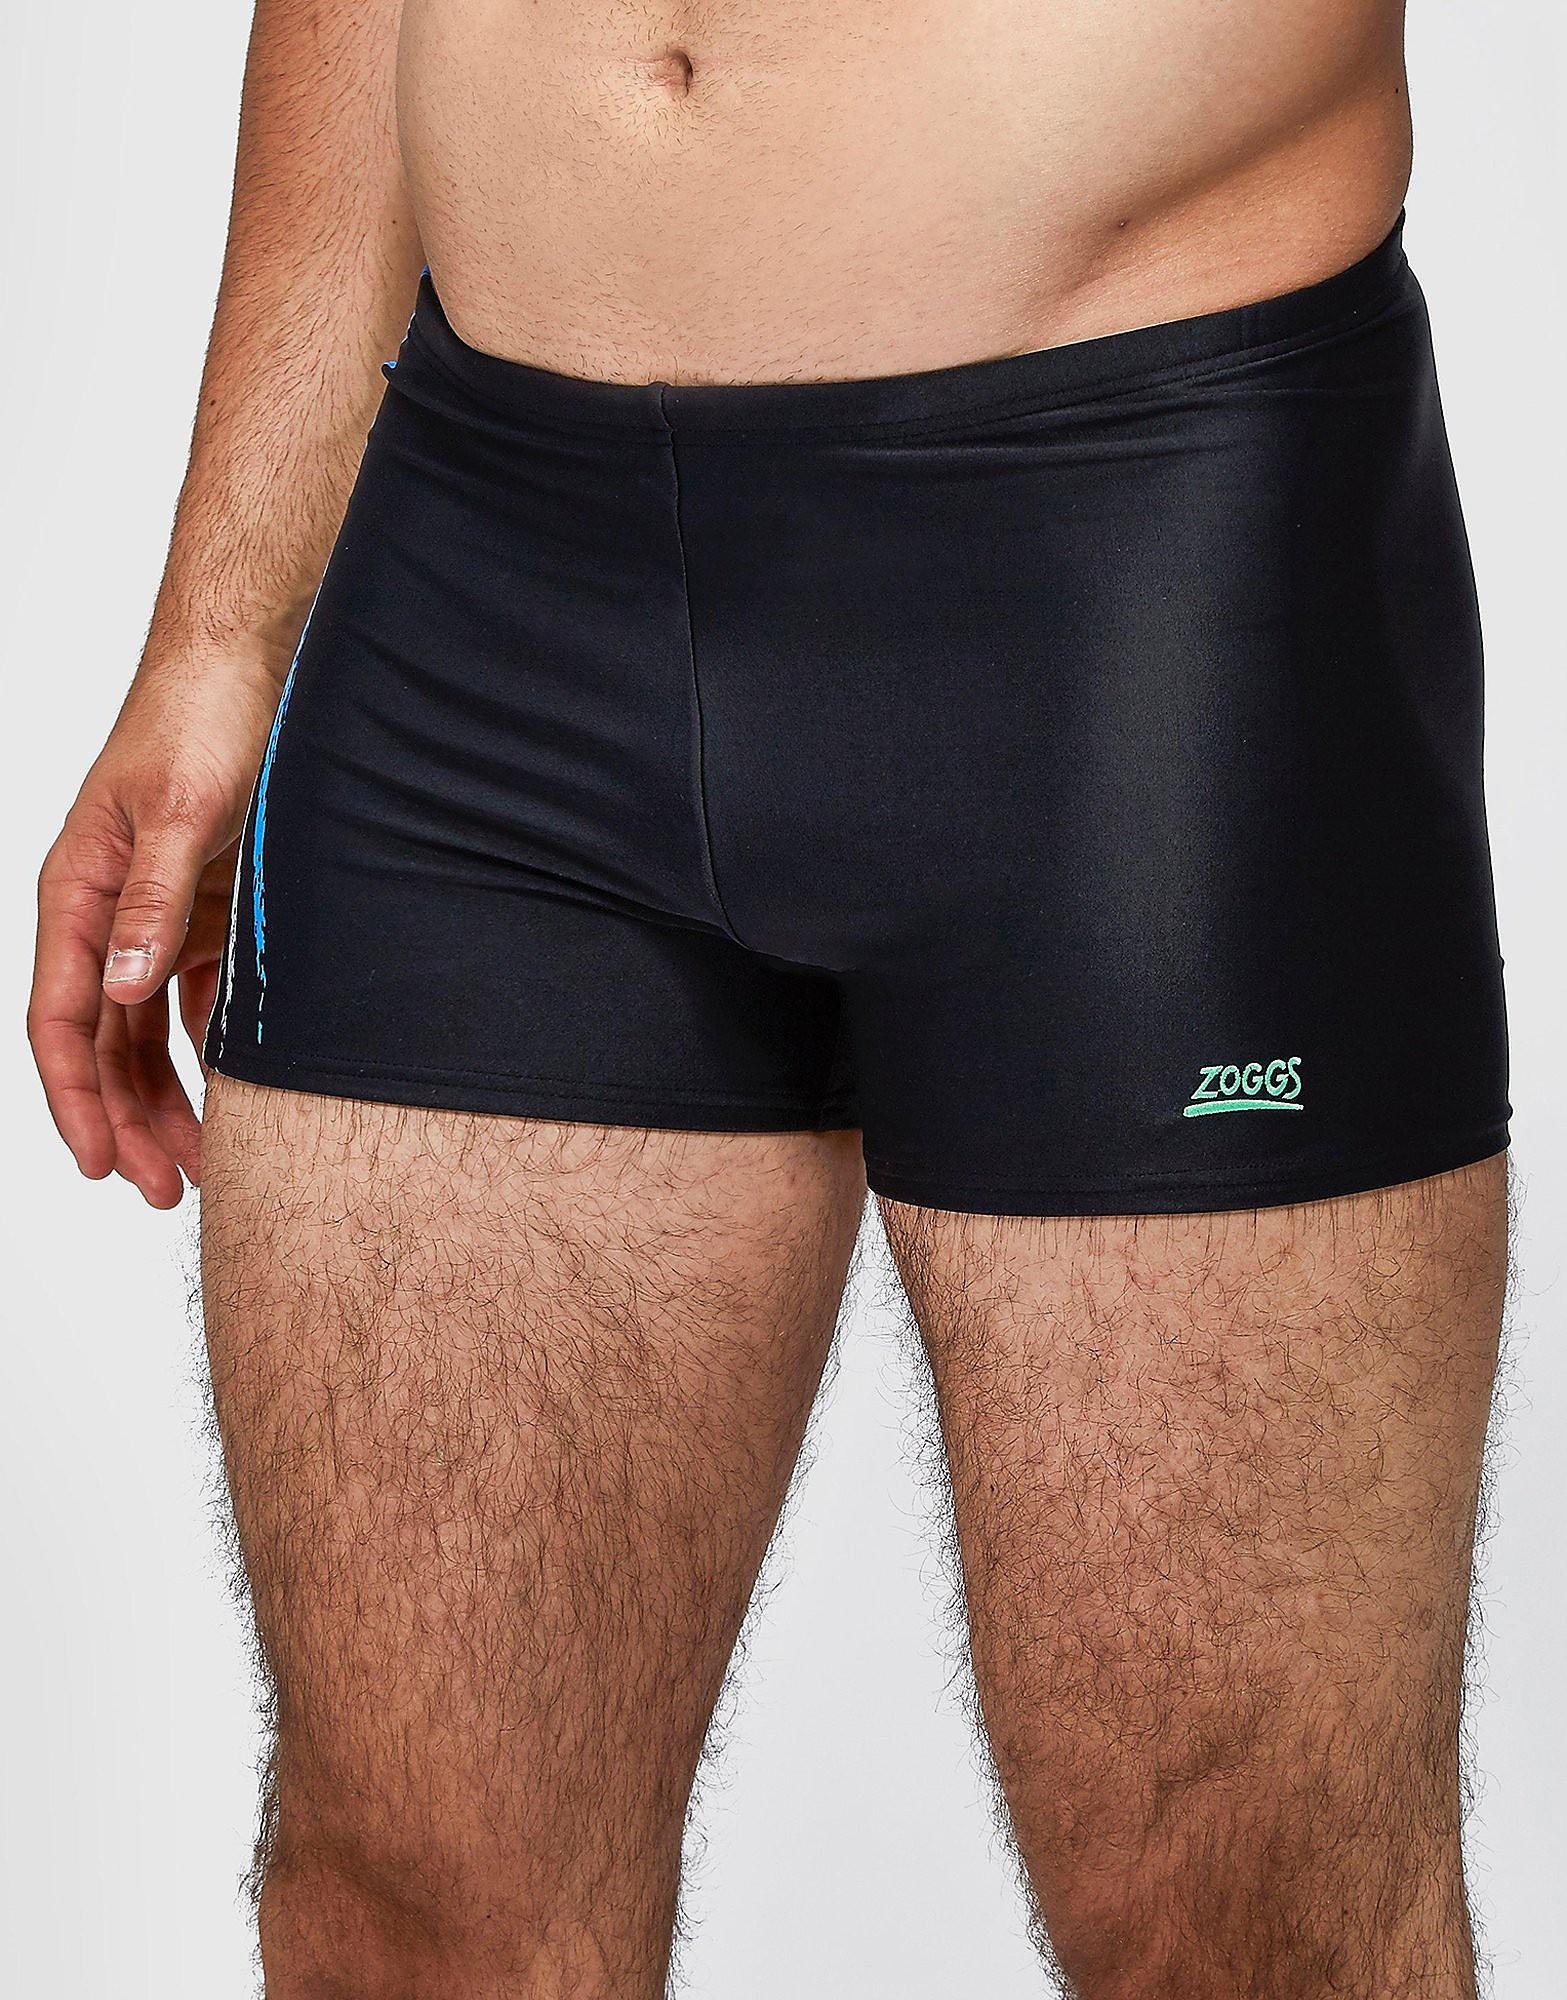 Zoggs Heathcote Hip Racer Shorts